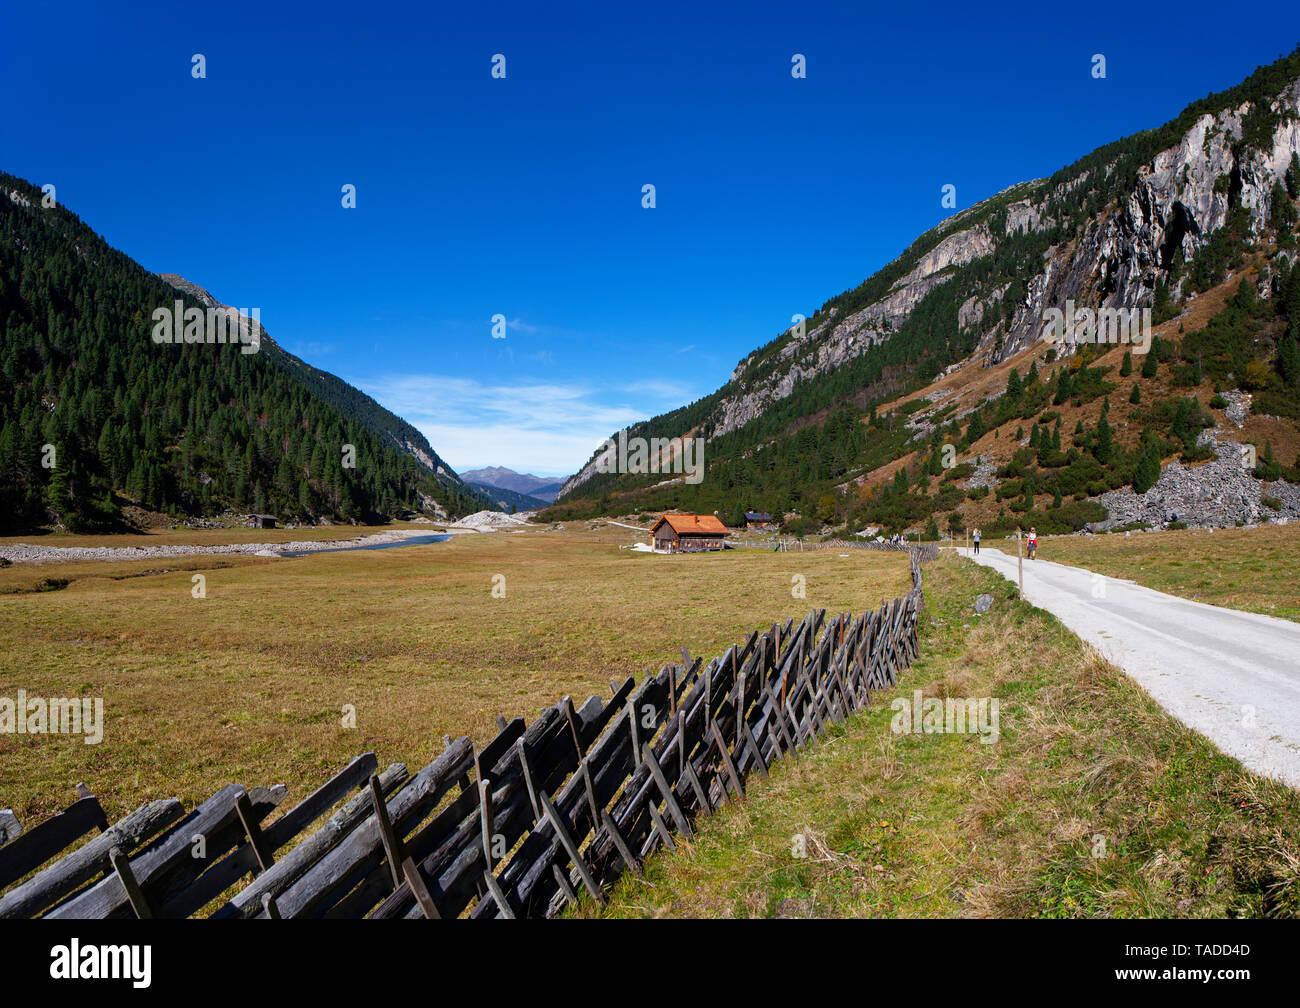 Austria, Salzburg State, High Tauern National Park, trail at Krimmler Ache Stock Photo